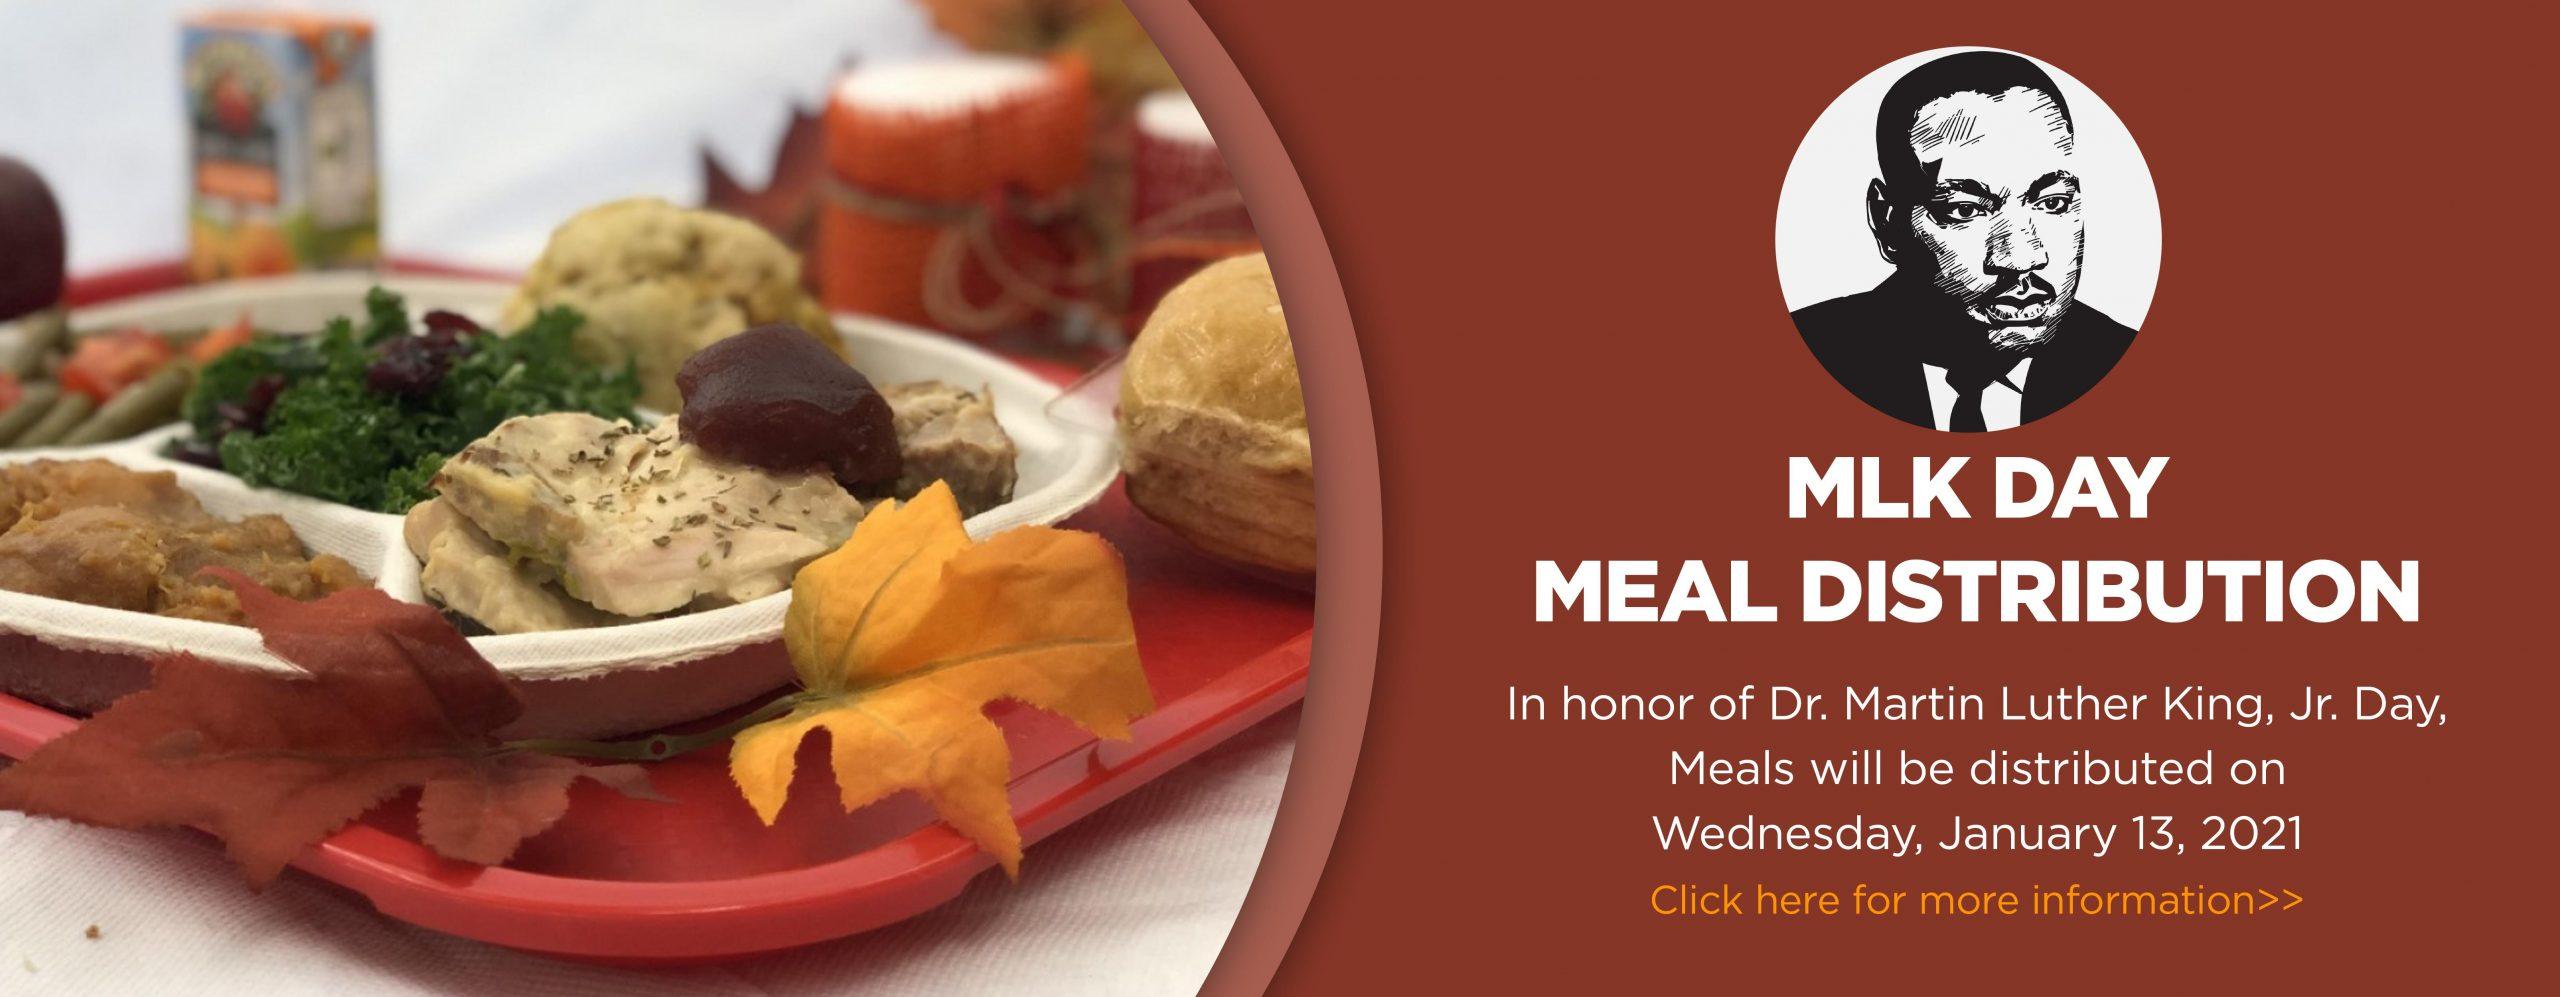 mlk-meal-distribution